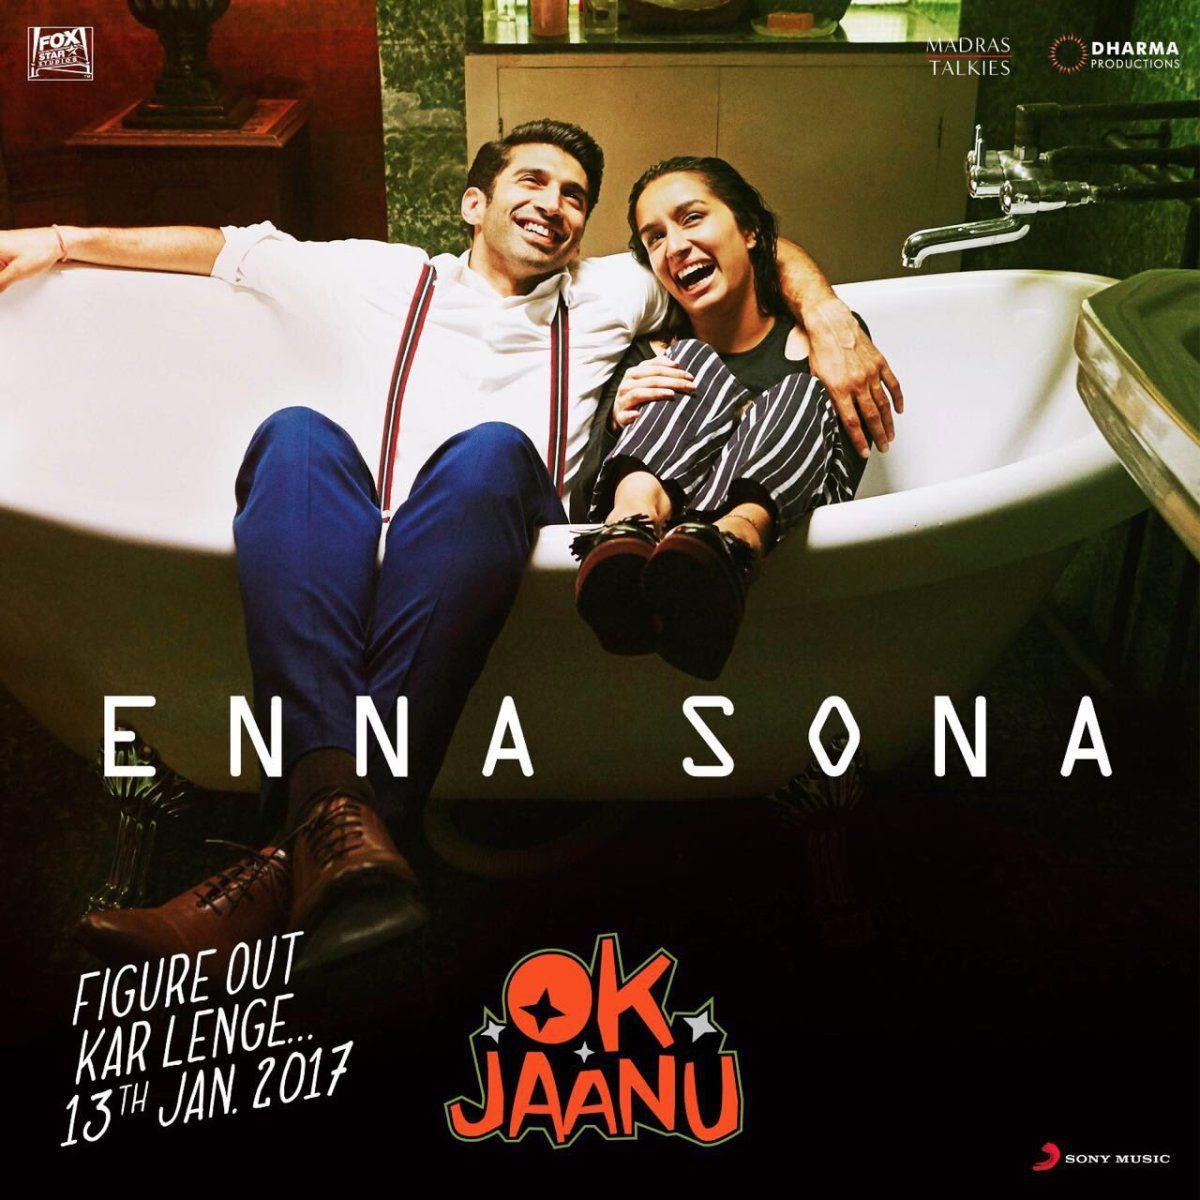 arjun marathi movie hd video song download